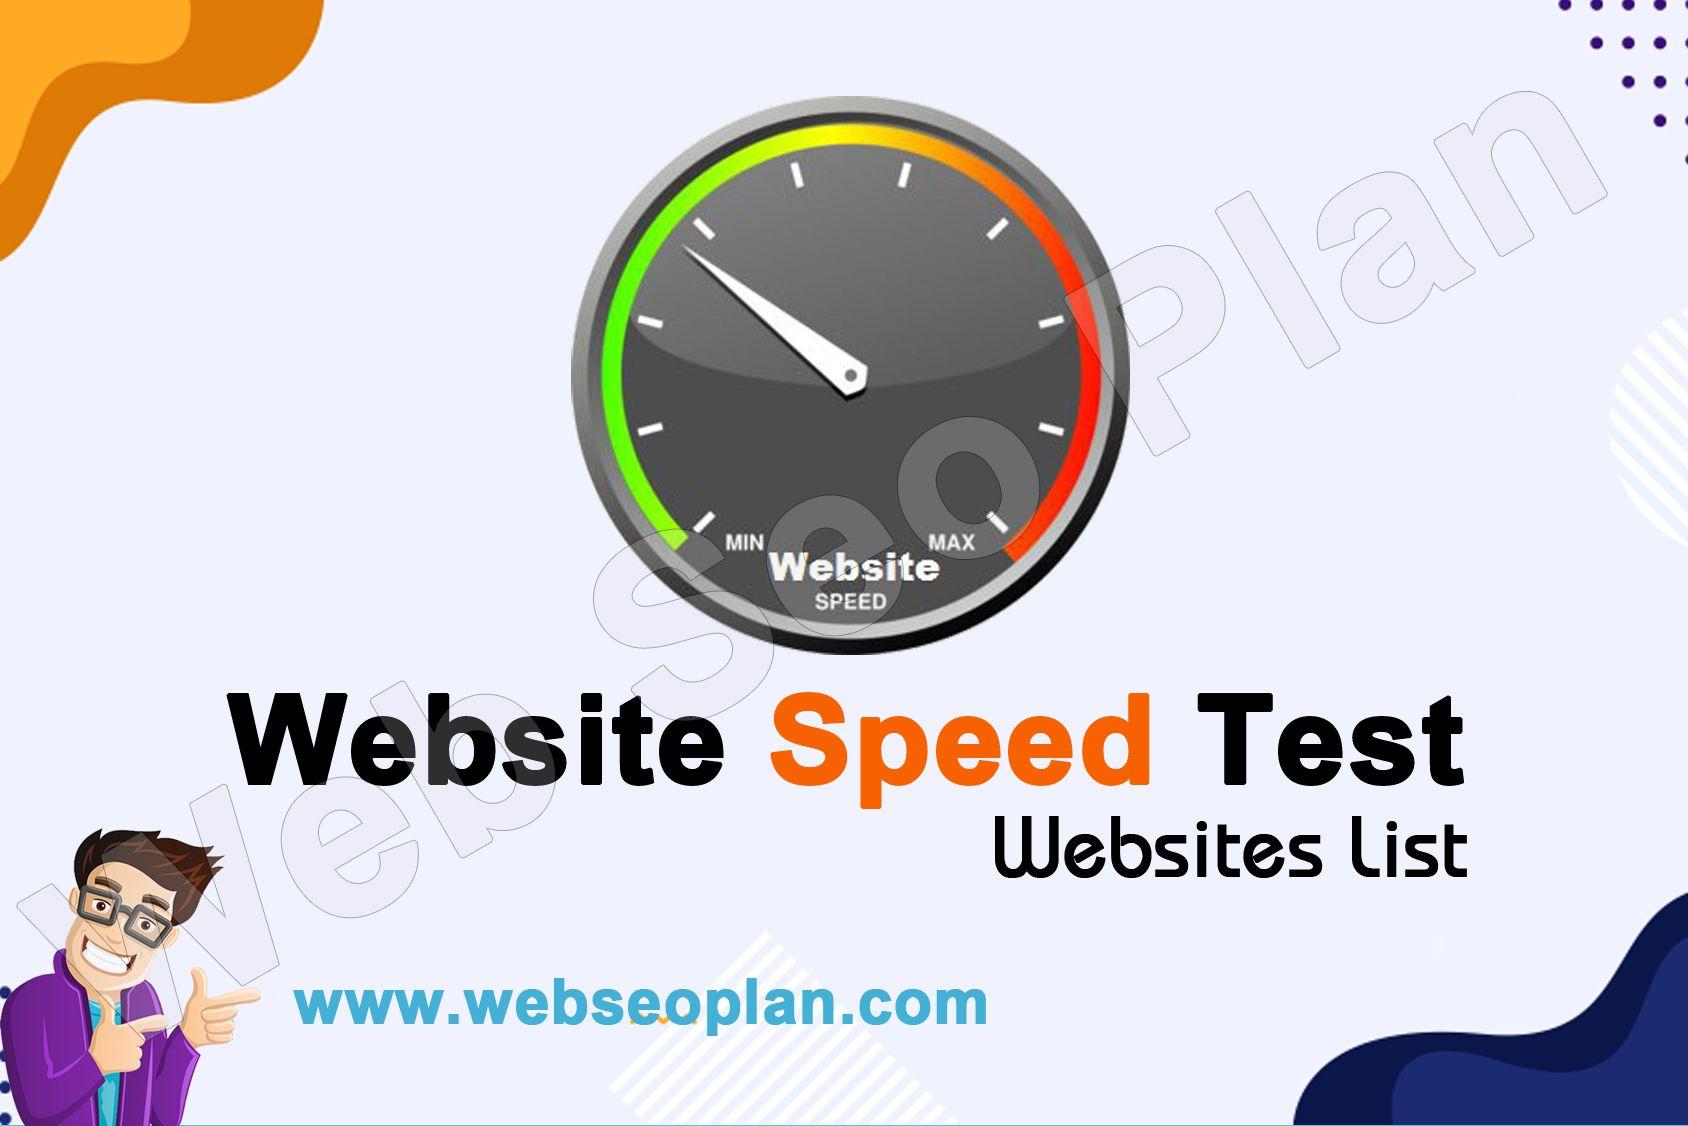 Website Speed Test Website List